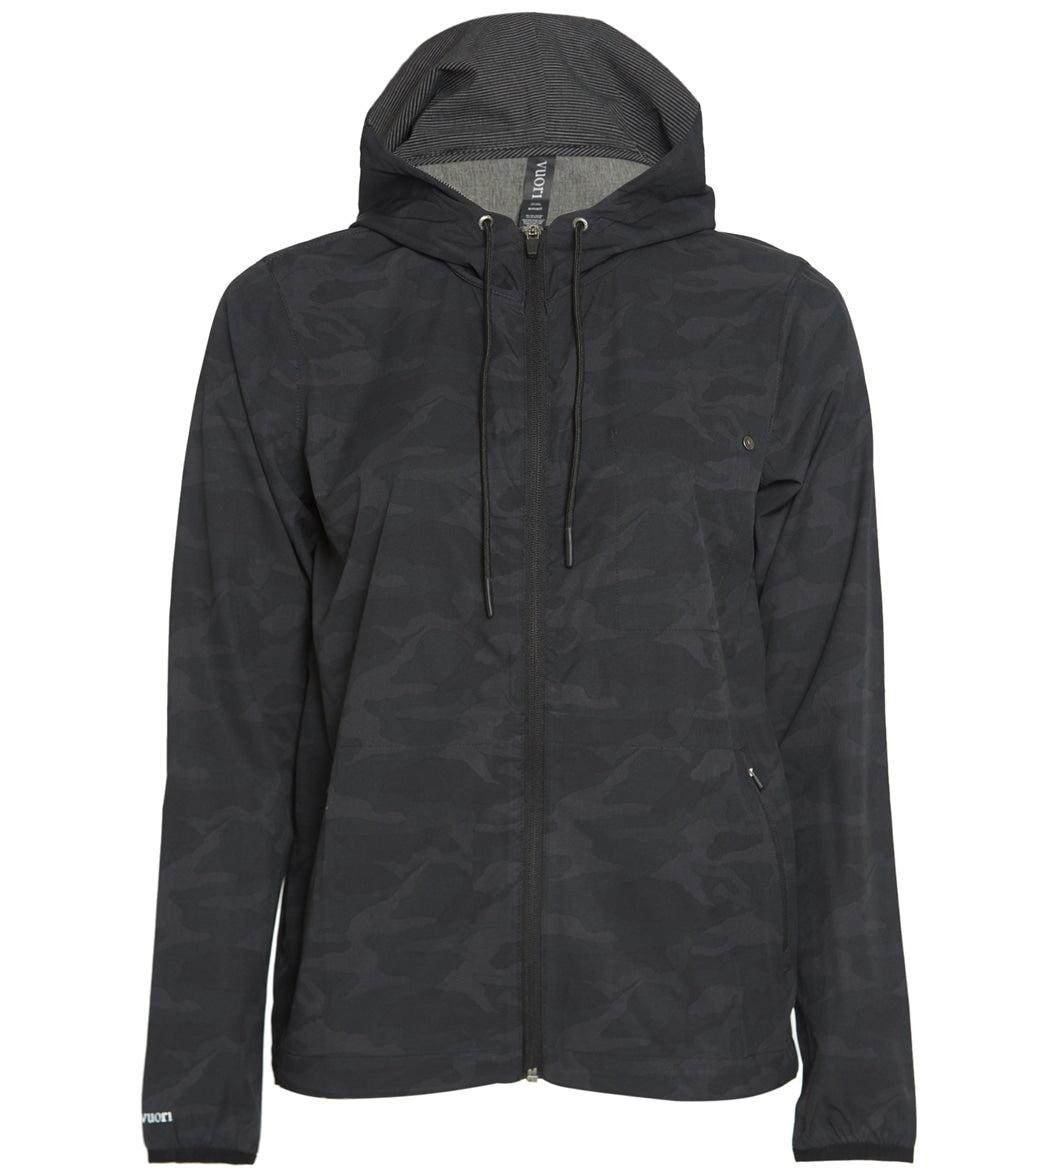 Vuori Women's Outdoor Trainer Shell - Camo Black - Medium Polyester/Elastane Top